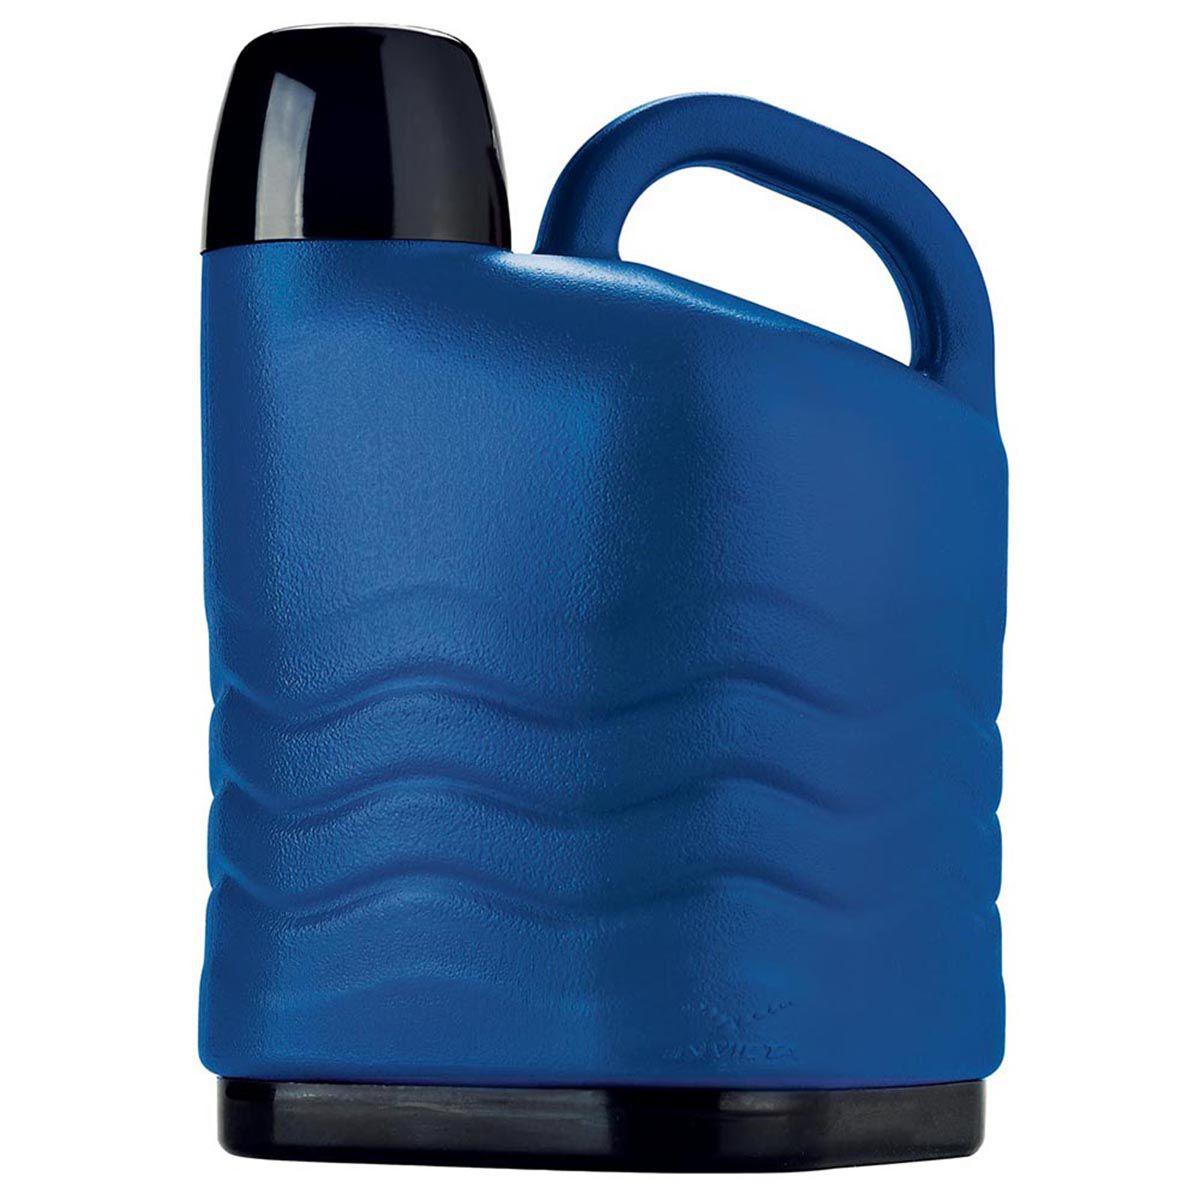 Garrafa Térmica  5 Litros Azul - Invicta  - AVENTÚ